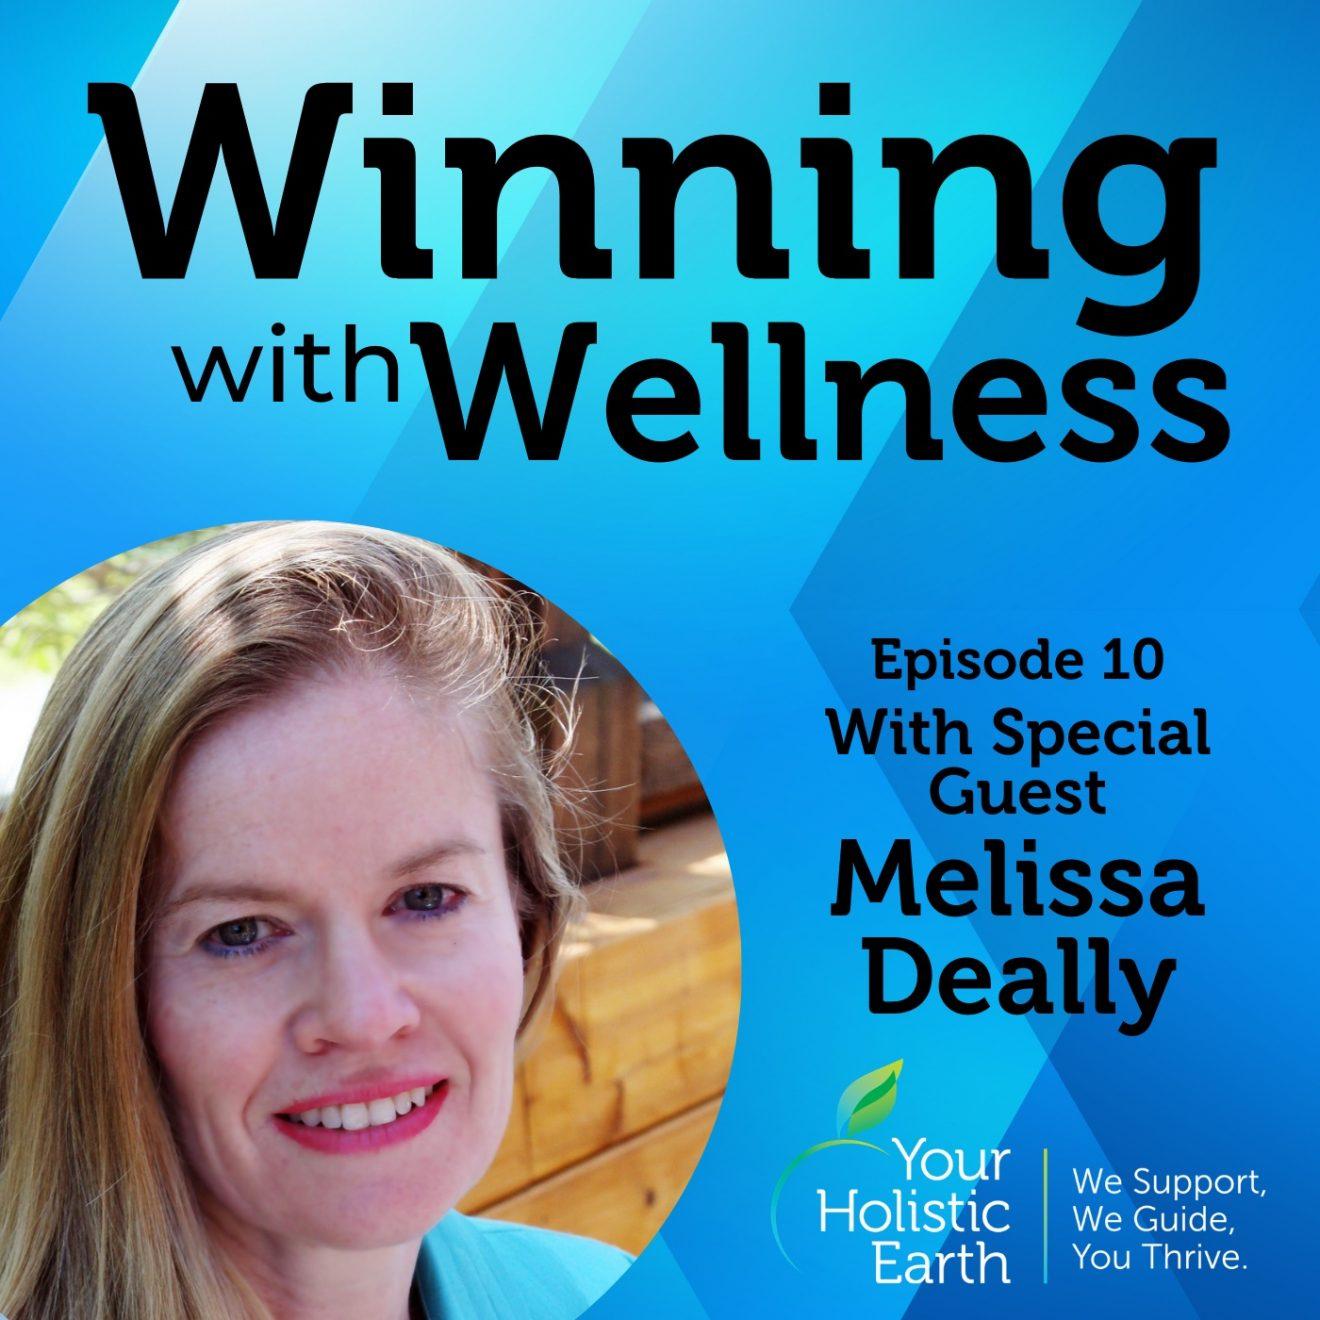 Winning With Wellness, with Jenny Ryce